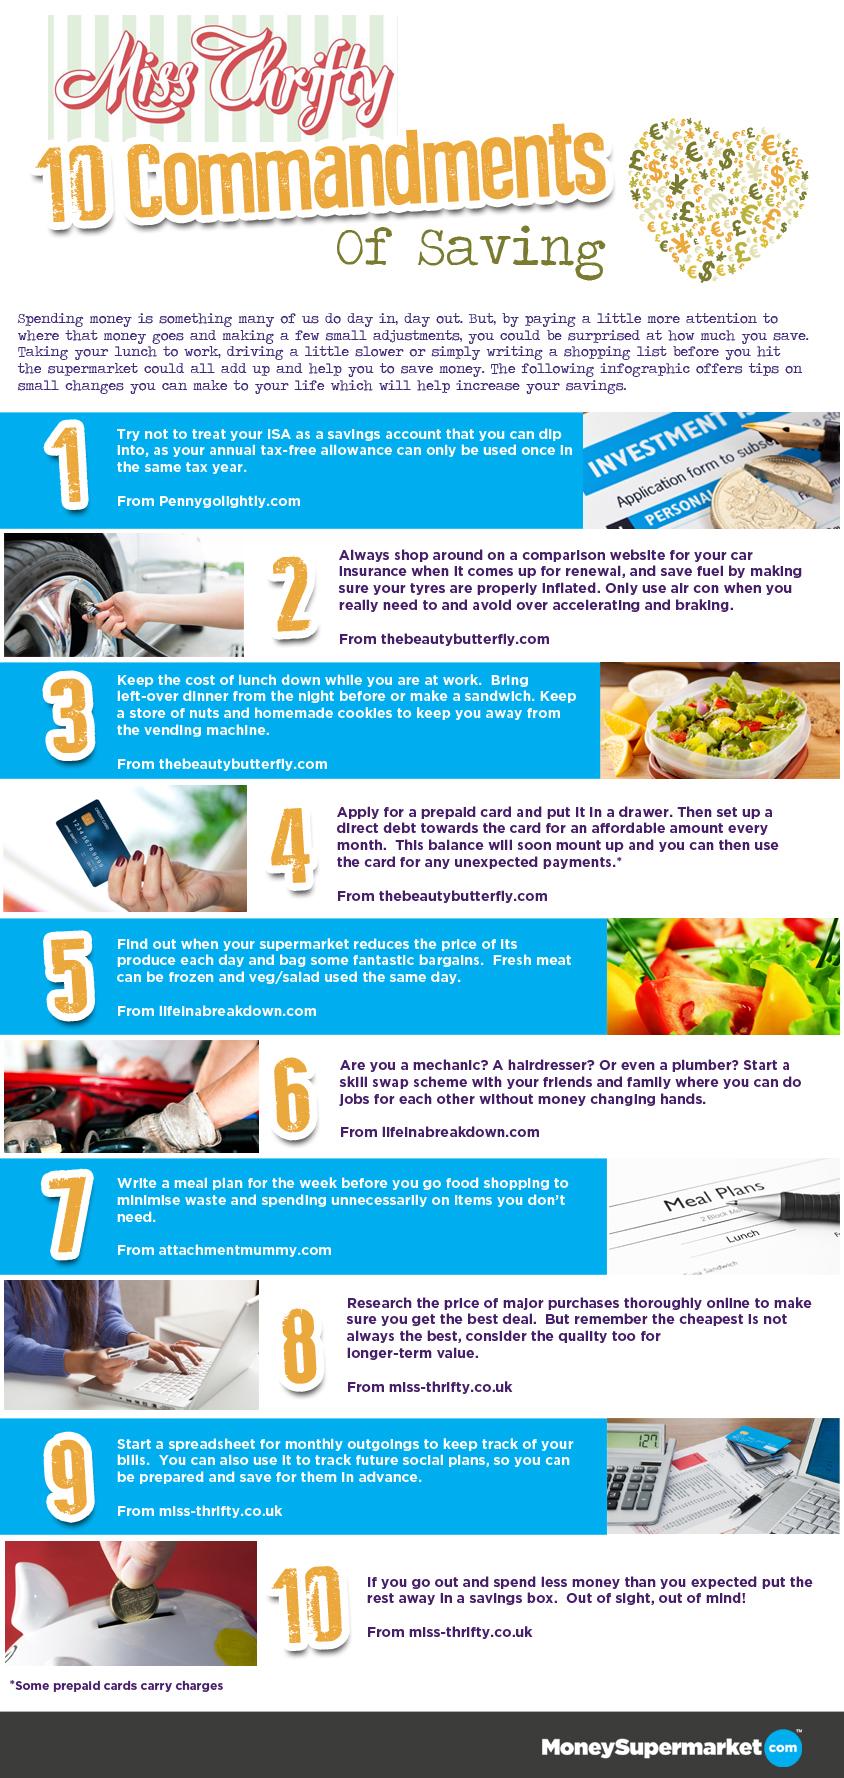 10 commandments of saving